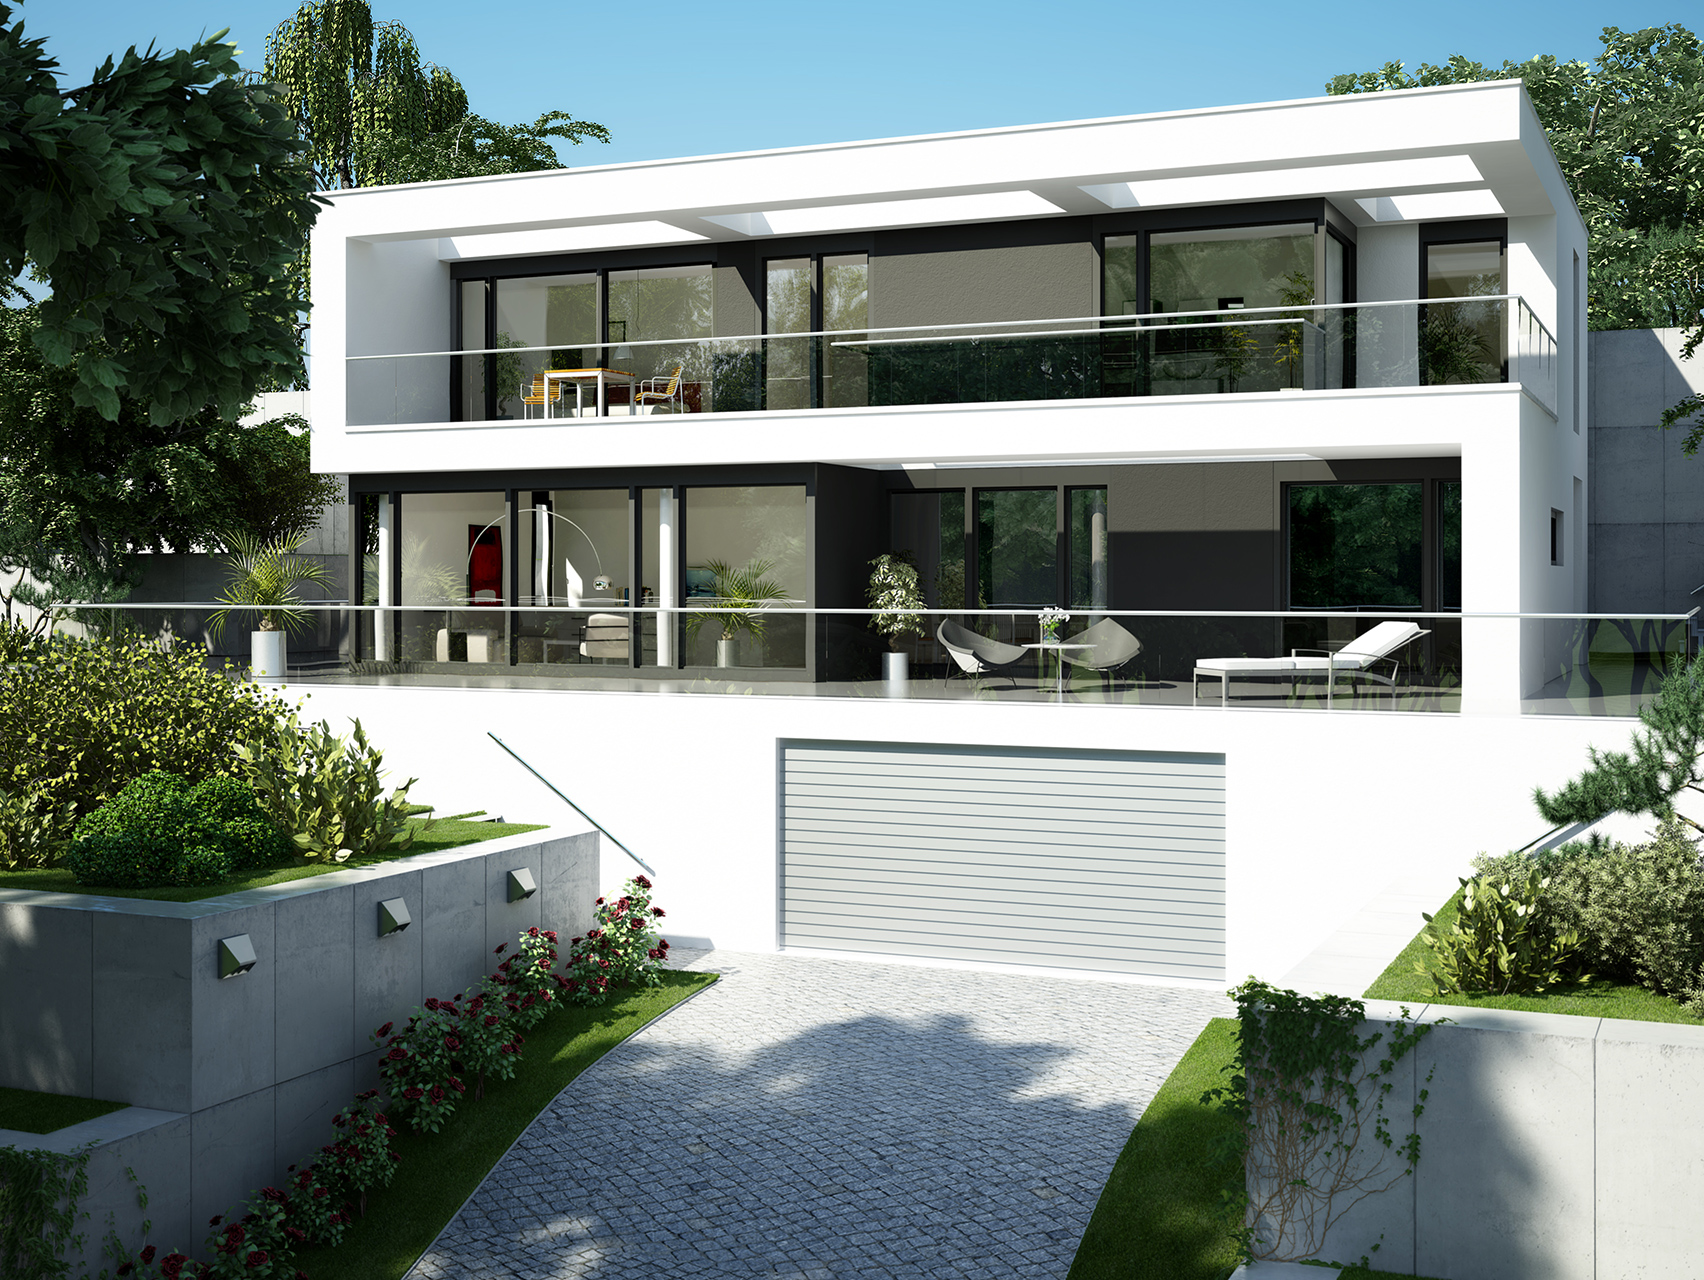 Planungsvorschlag villa im bauhausstil for Modernes haus technik